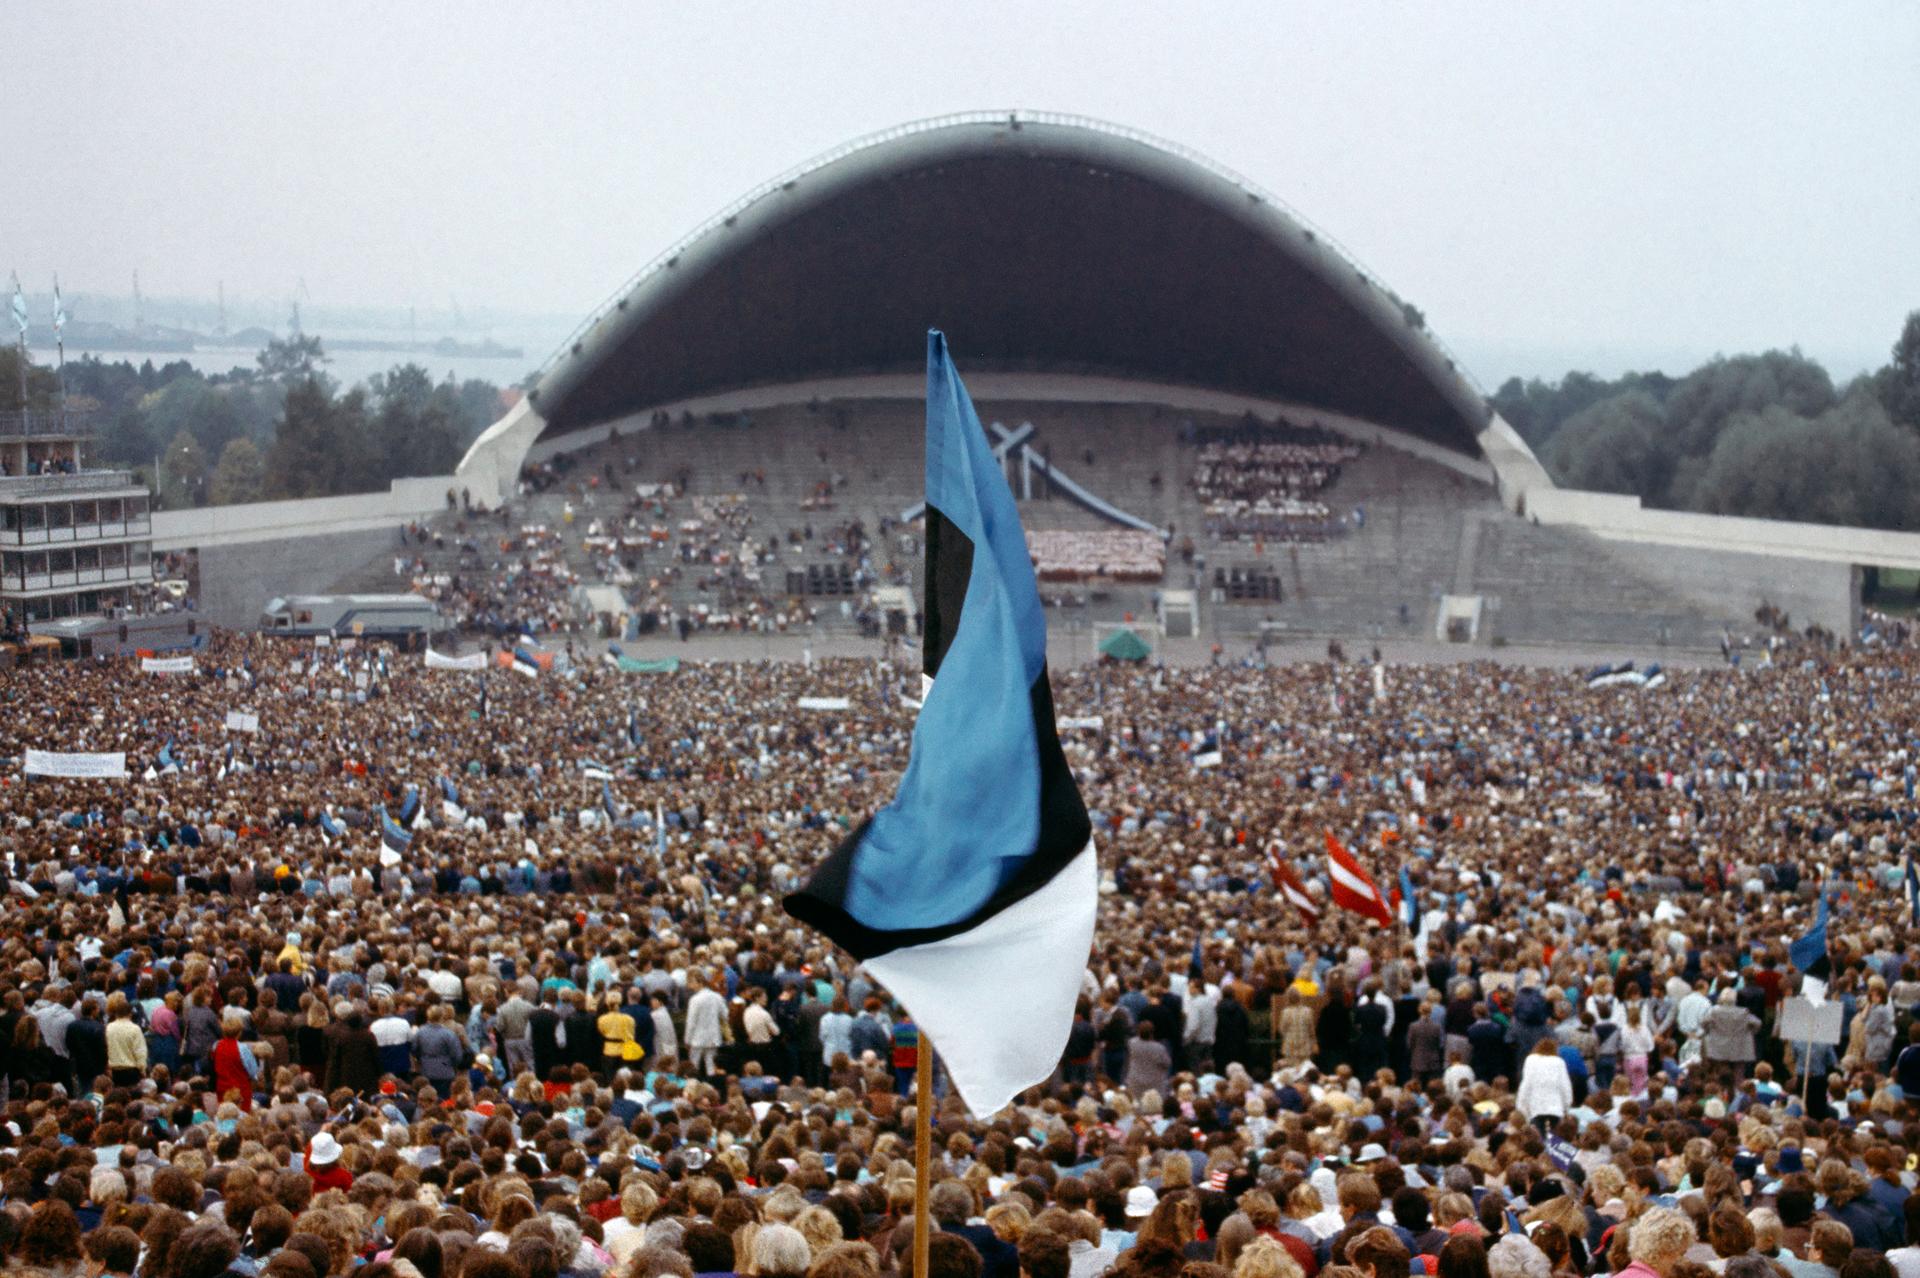 Lauluväljak 是愛沙尼亞每五年一度的歌唱節的大本營, 1988 年的音樂會,啟動了愛沙尼亞甚至是波羅的海共和國的獨立運動。圖為 1988 年三十萬人聚集的盛況。 Photo by Tonu Norritts / Art Directors